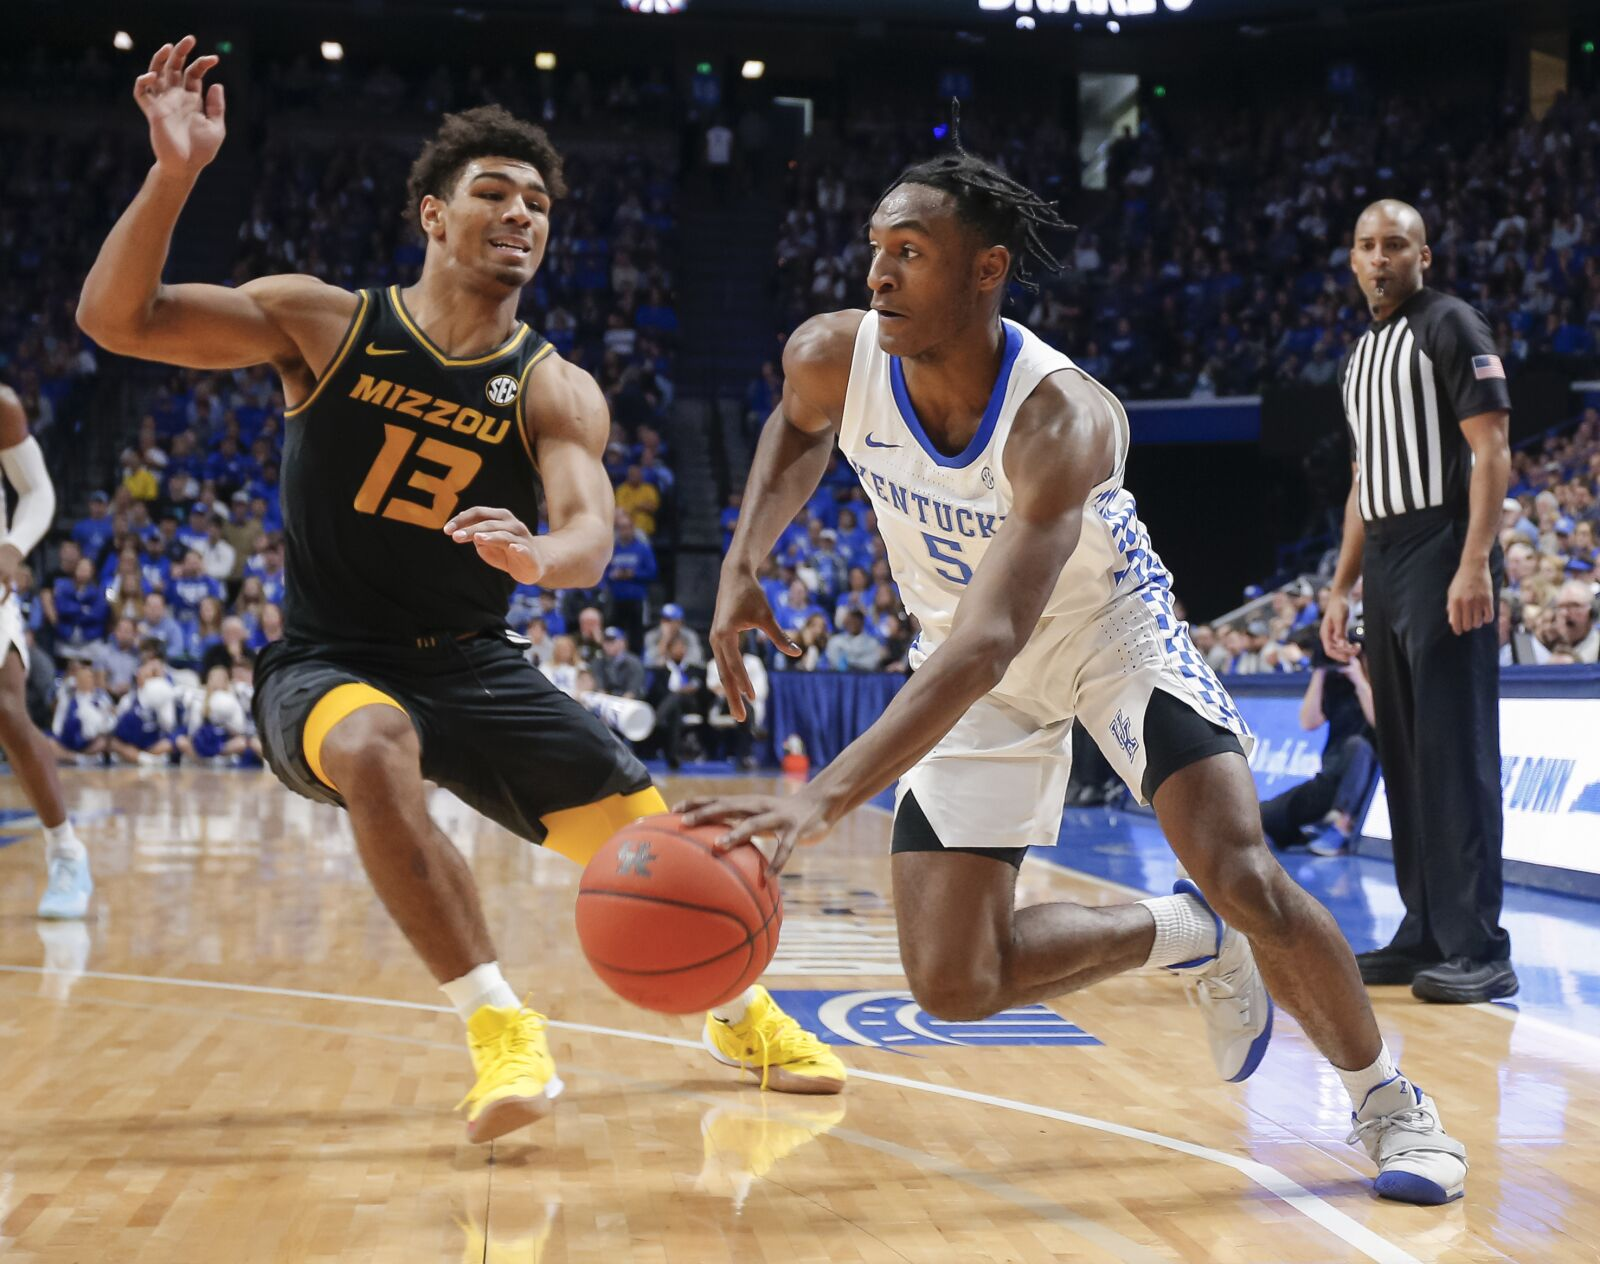 Missouri basketball vs. Alabama: Tip-off time, radio, odds and more